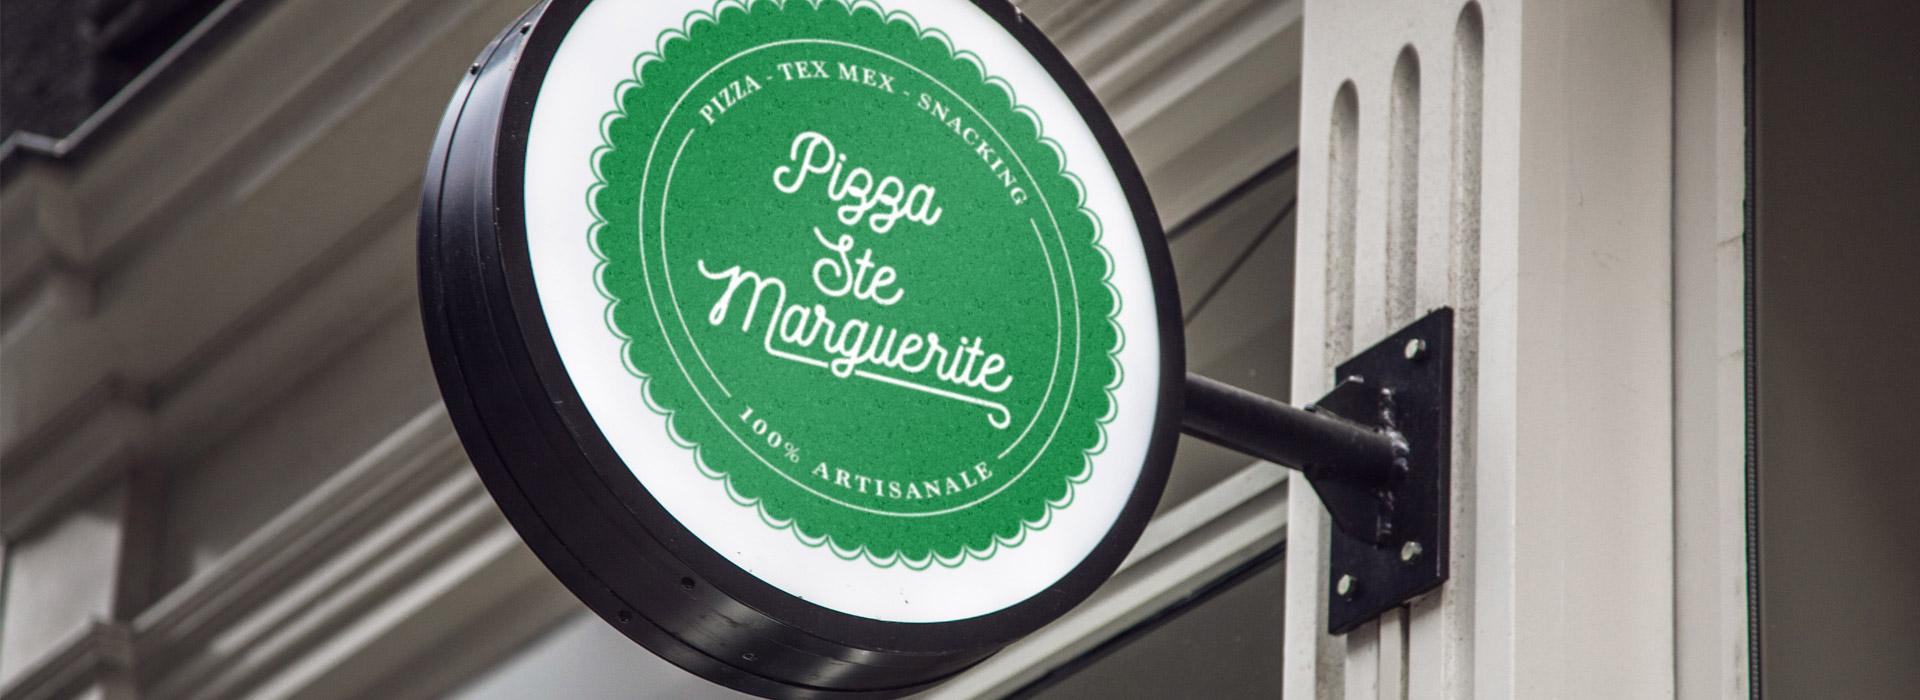 http://logo-pizza-ste-marguerite-paysage-web